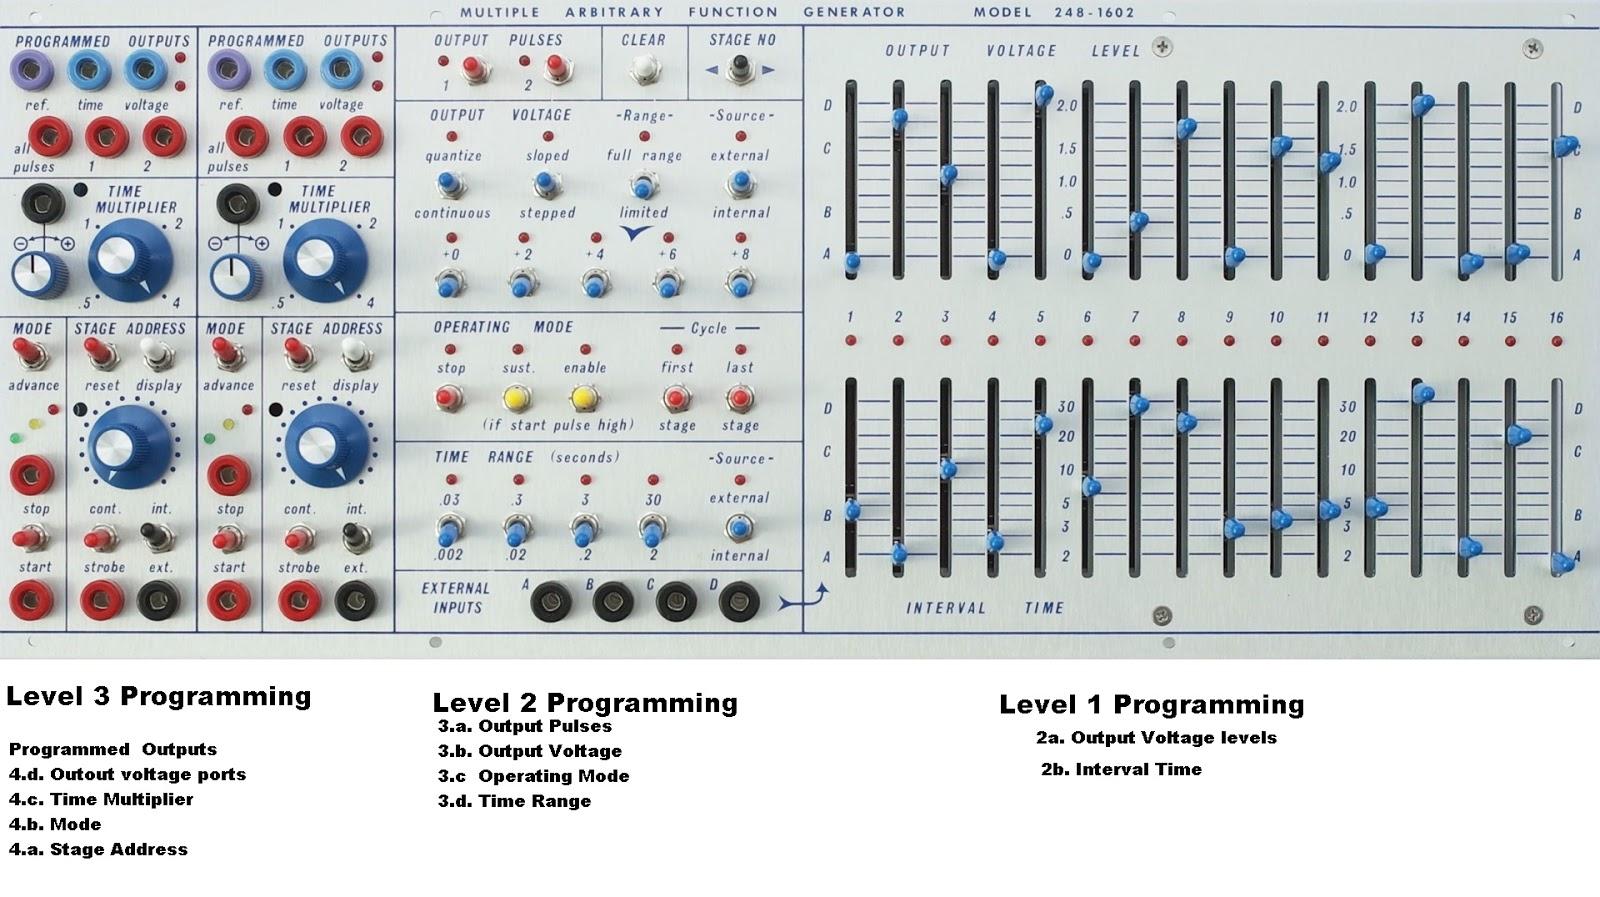 JonDent - Exploring Electronic Music: Buchla MArF - Manual interperation